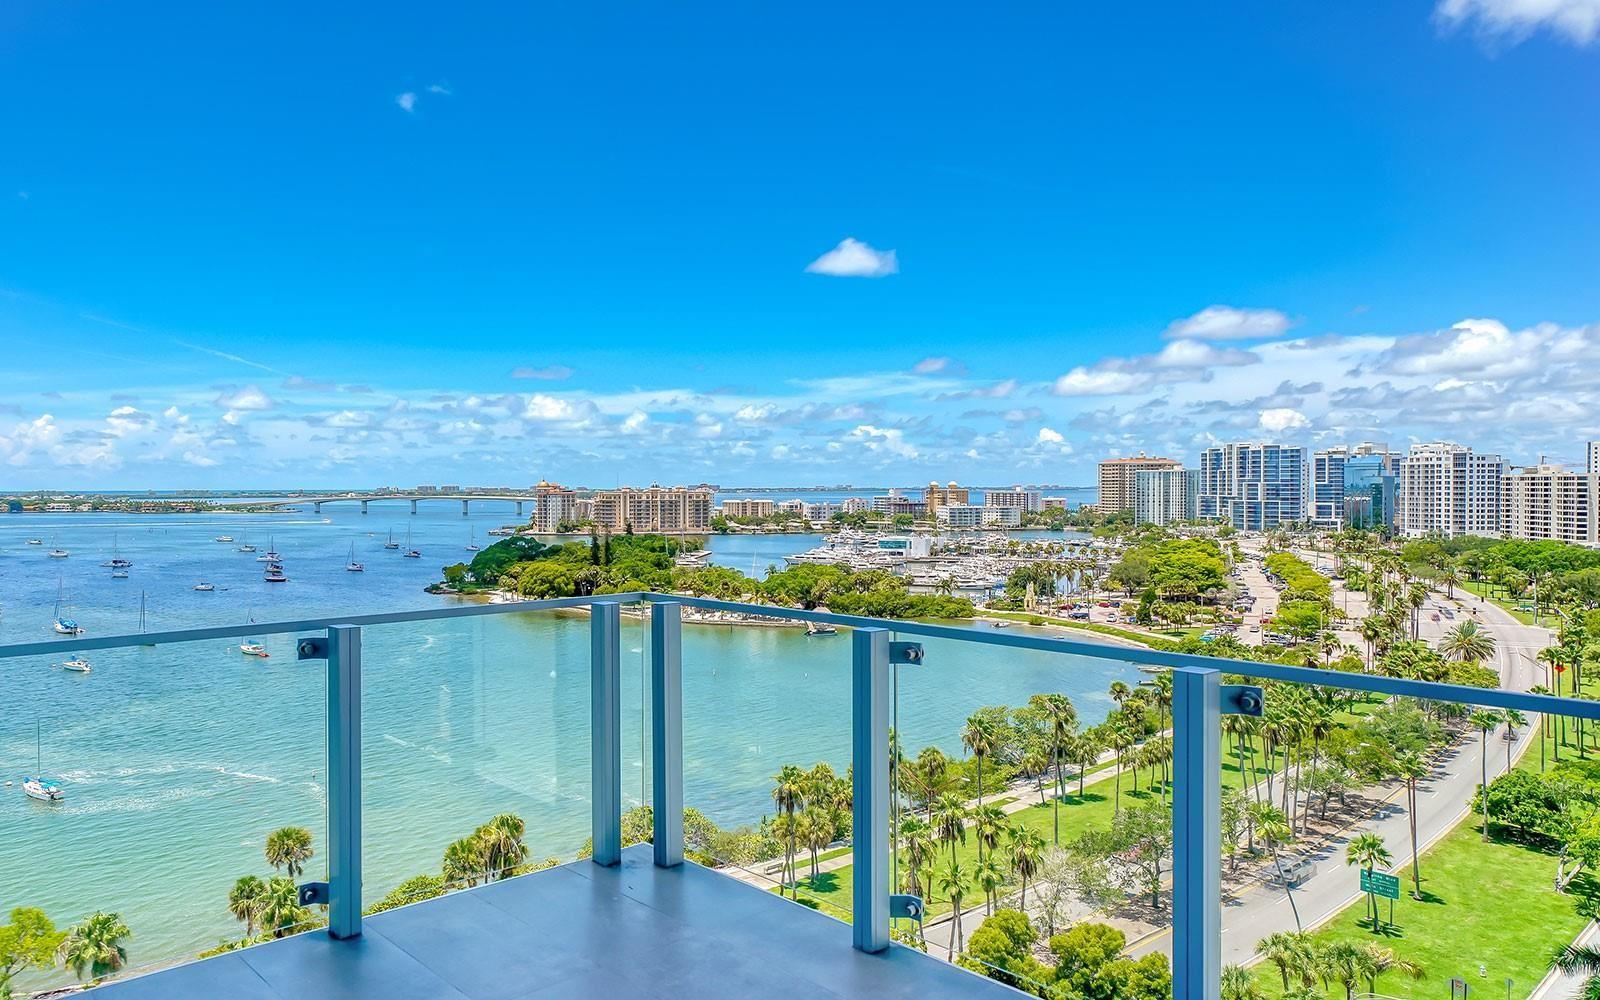 605 S GULFSTREAM AVENUE #10N, Sarasota, FL 34236 - #: A4507687